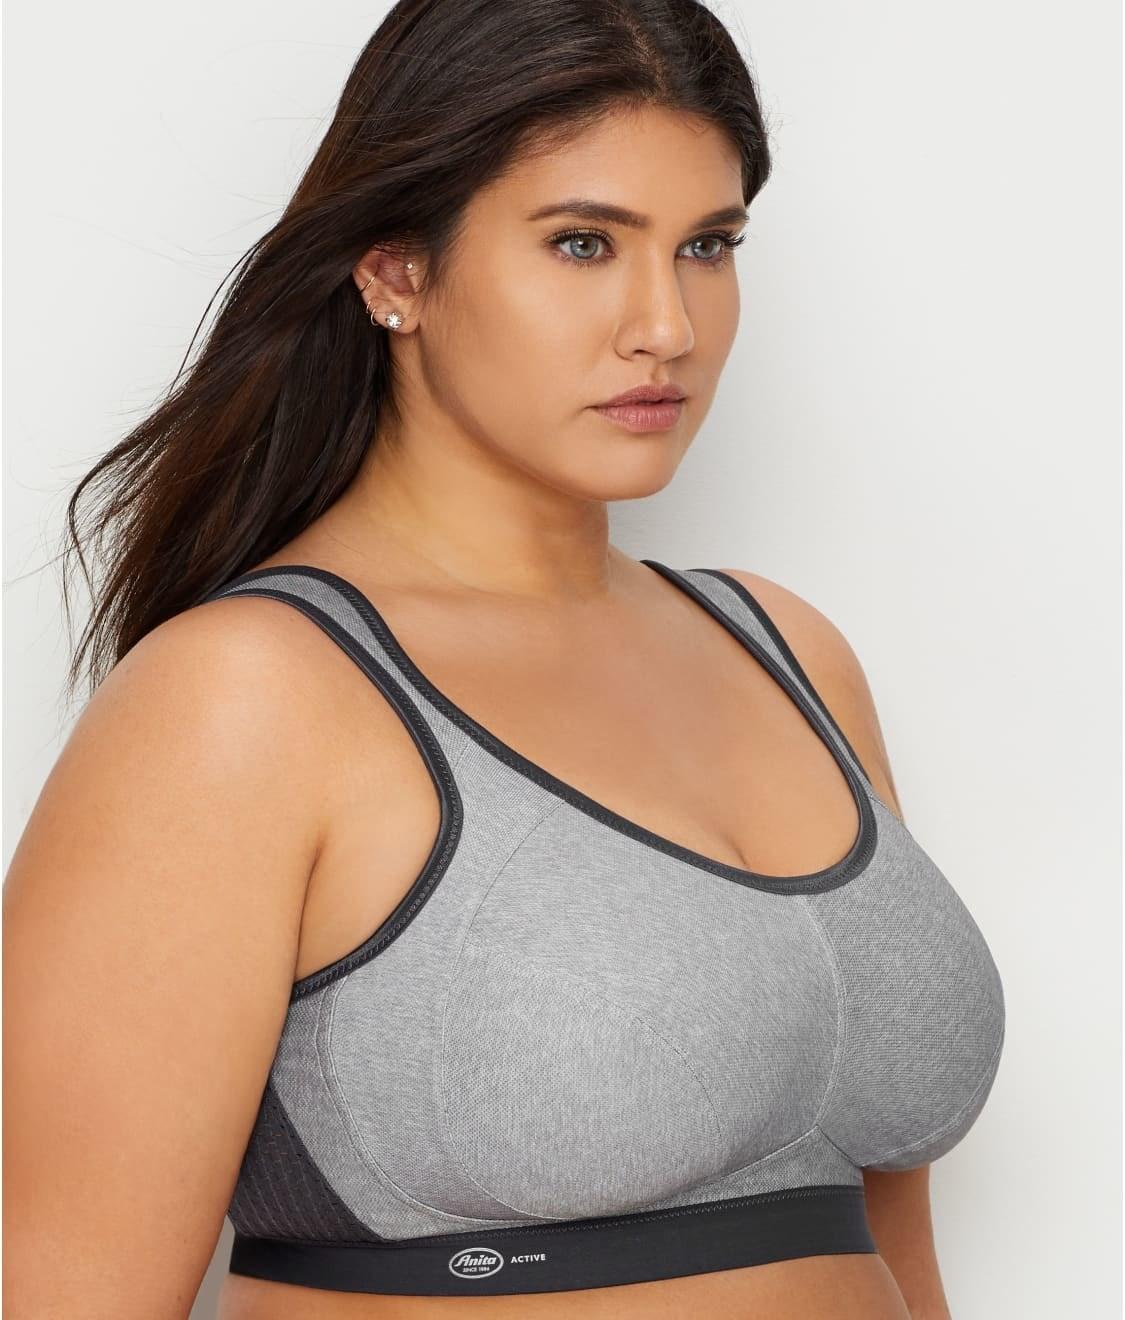 model wears gray and black high-impact sports bra